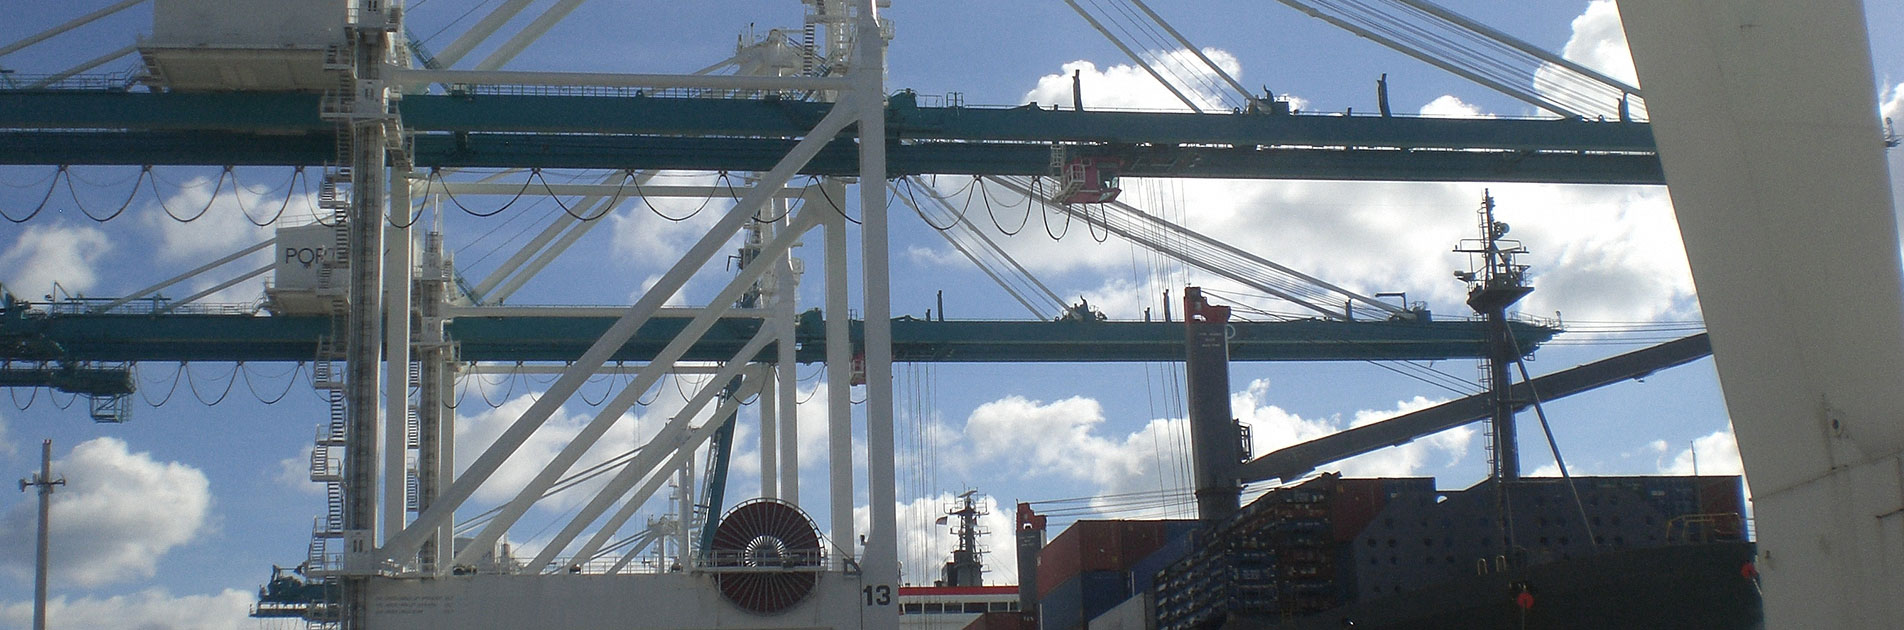 Brieda Cabins - Terminal port installation